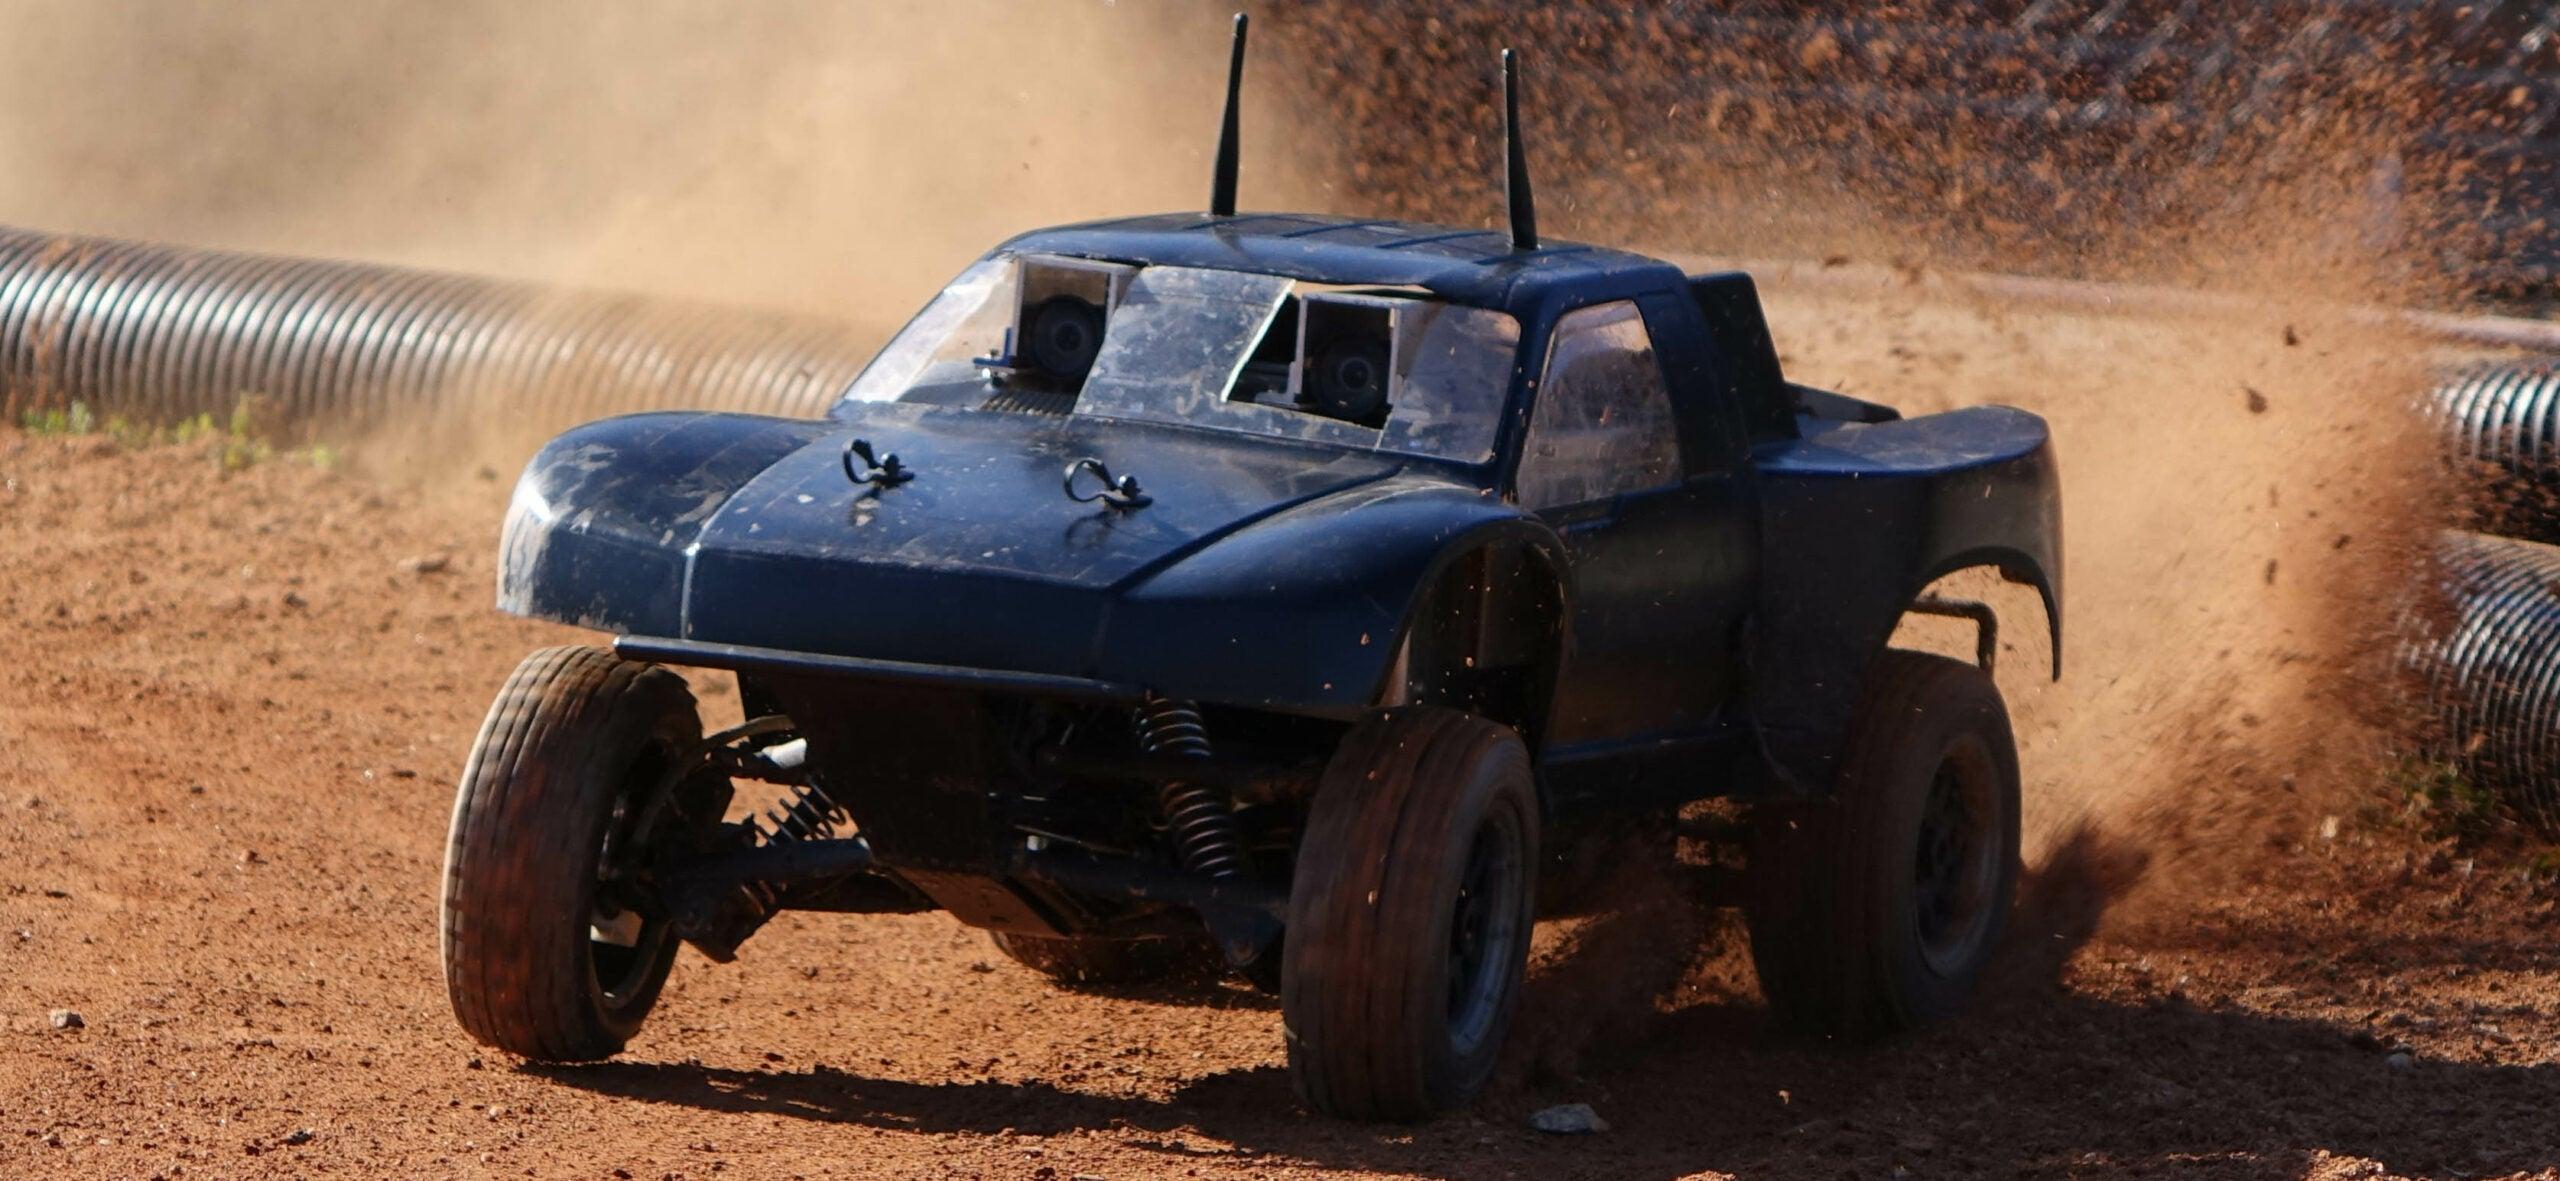 Georgia Tech Builds An Aggro Autonomous Rally Car